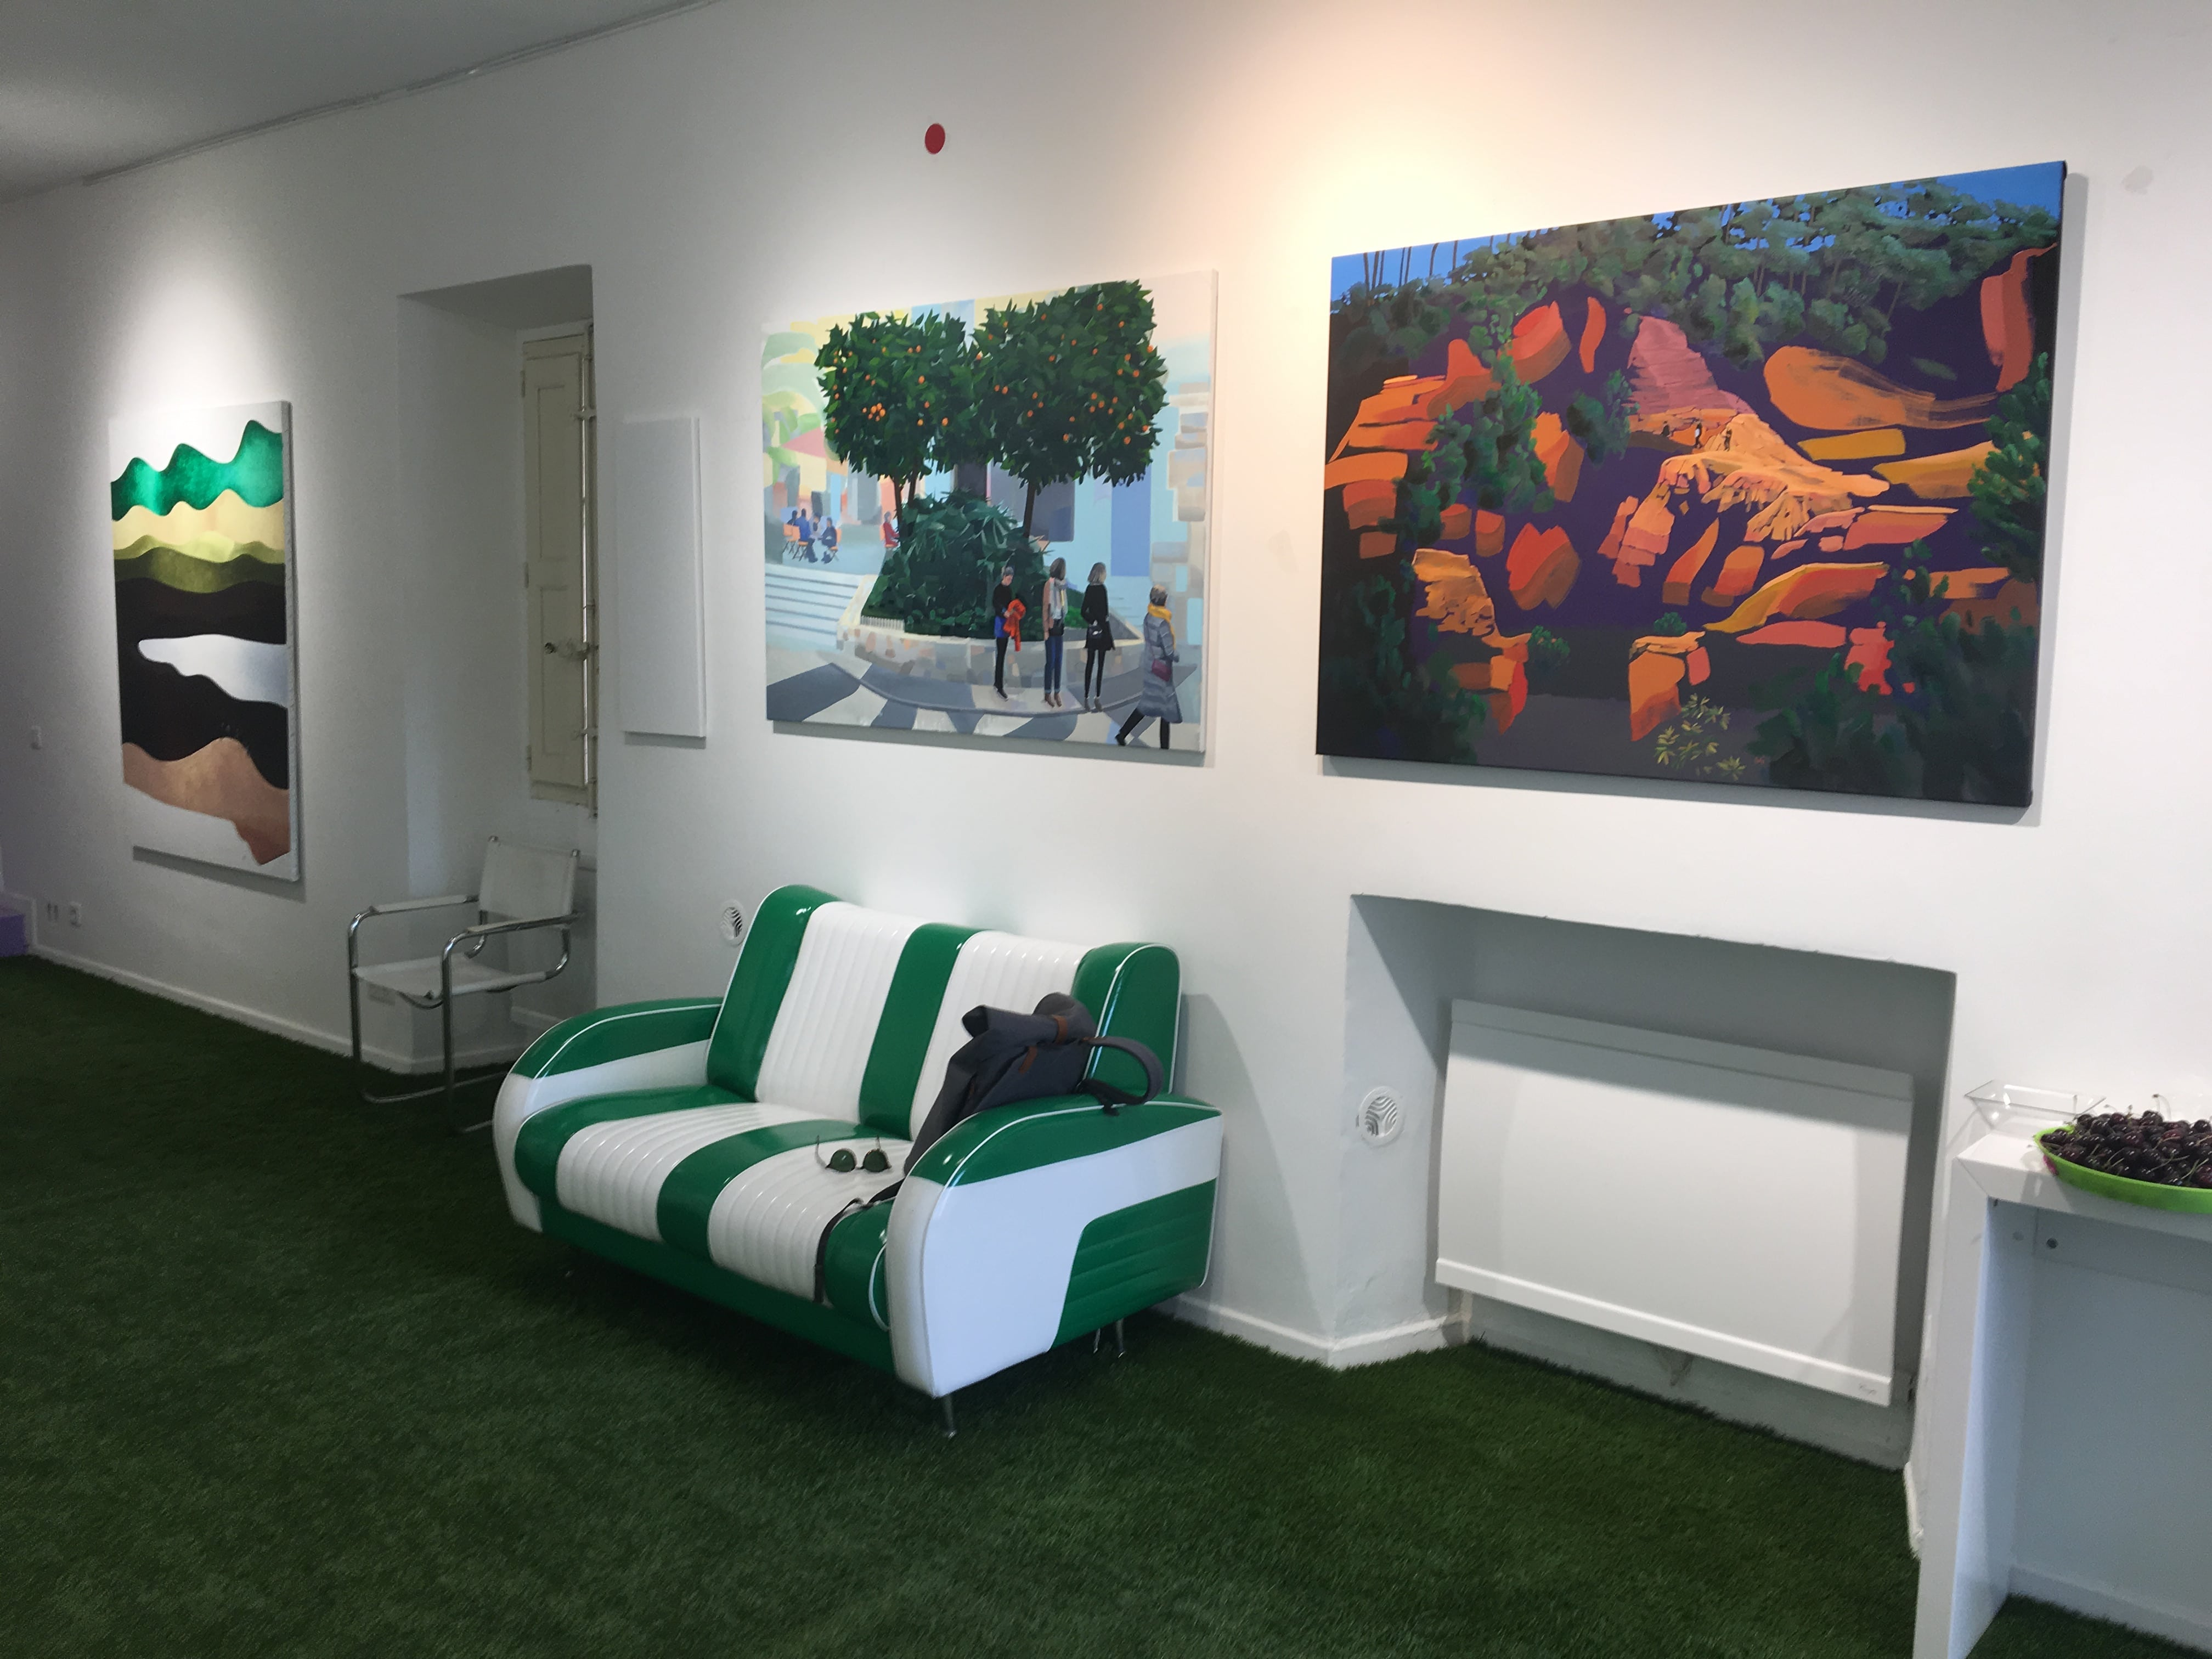 Vue-Must-Gallery-Gordes-Exposition-Mathieu_Iquel-2019-min